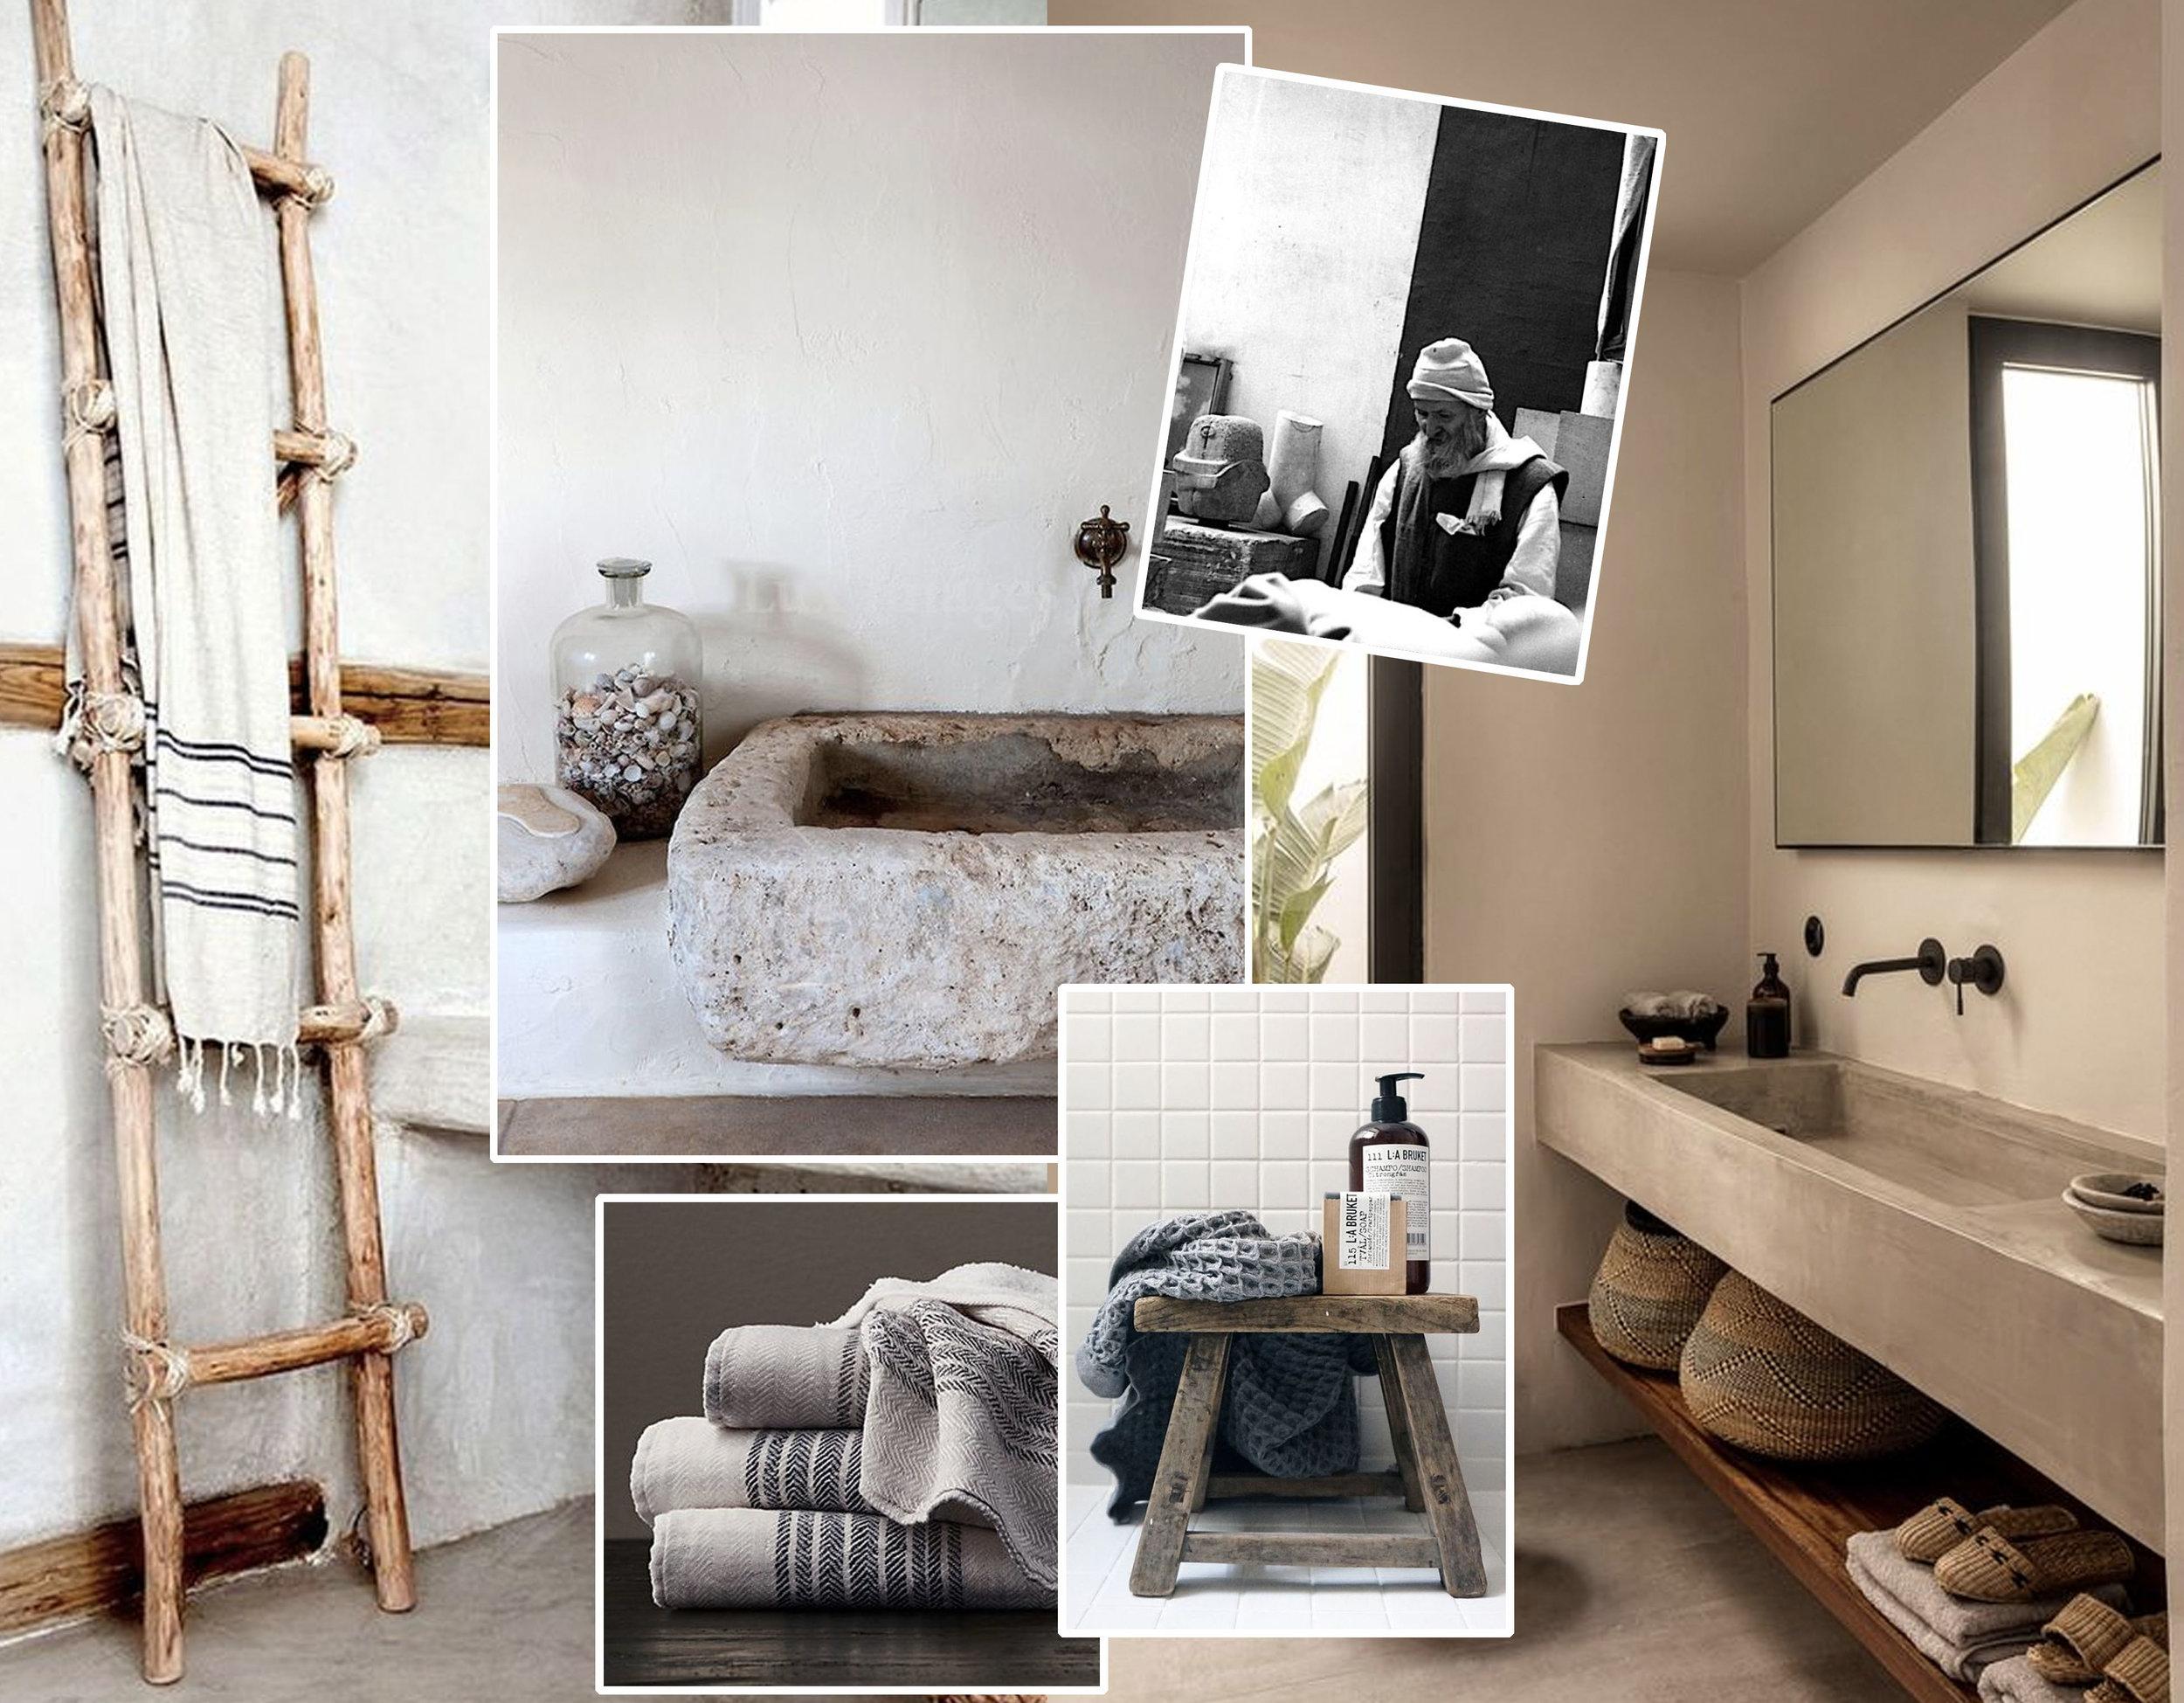 Brancusi  - bathroom image via  Planete Deco  - stone washbasin via  Style Files  - bamboo towel rack via  My Domaine  - wooden stool via  My Full House  -